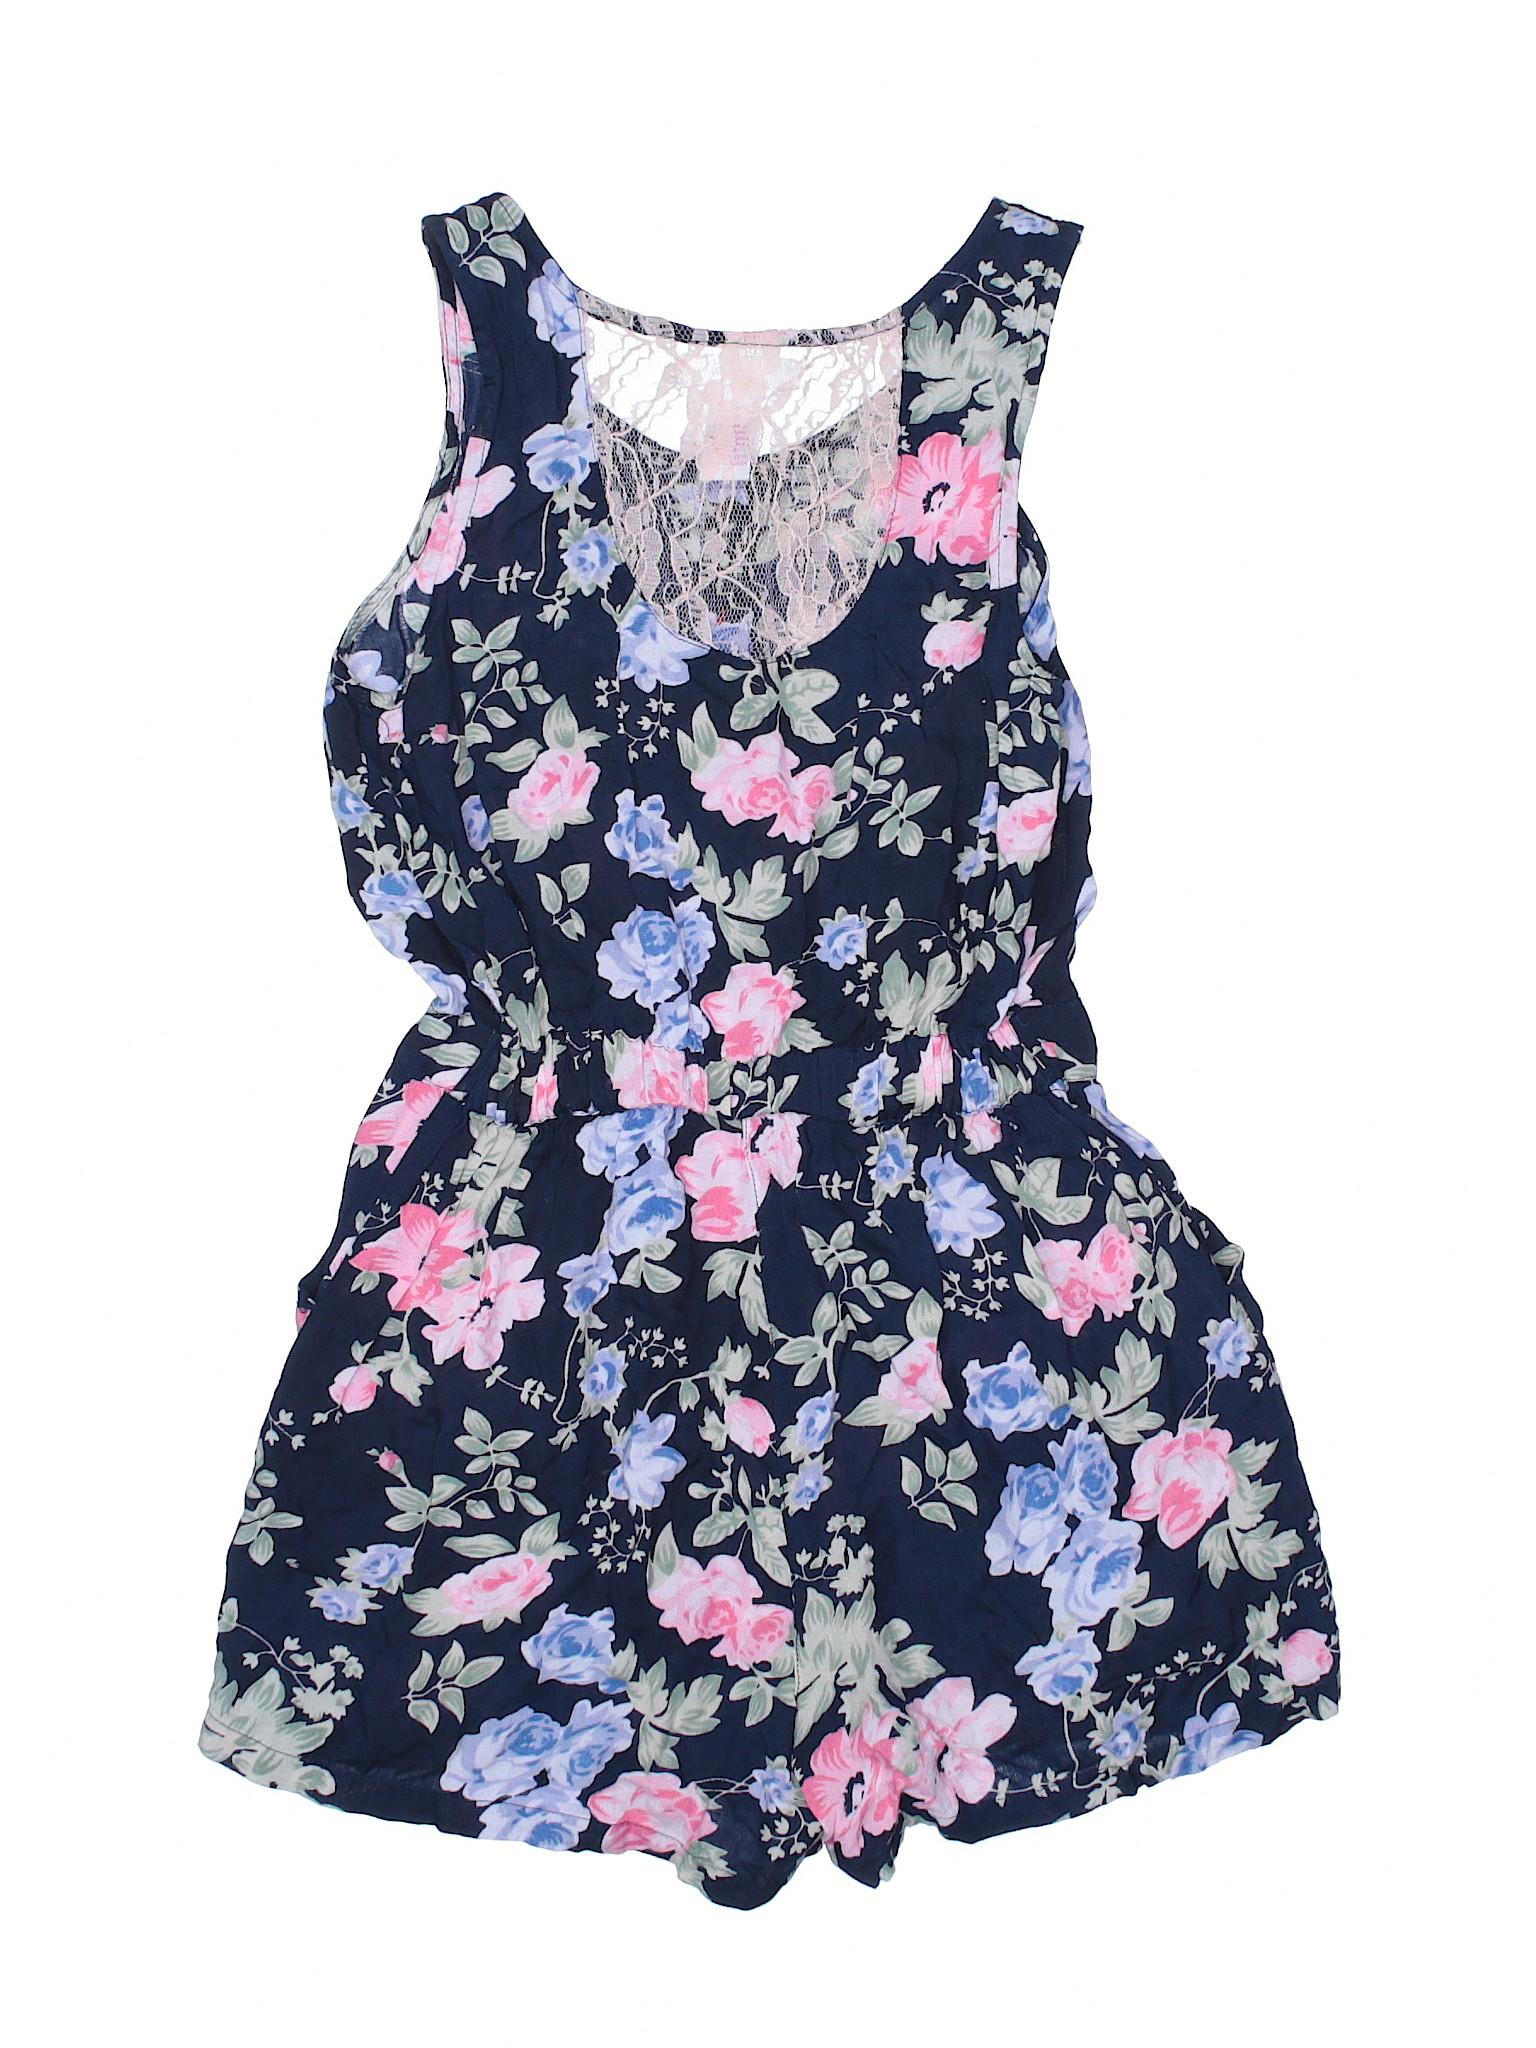 3485a8a2a4d Japna Kids 100% Rayon Floral Dark Blue Romper Size 12 - 65% off ...